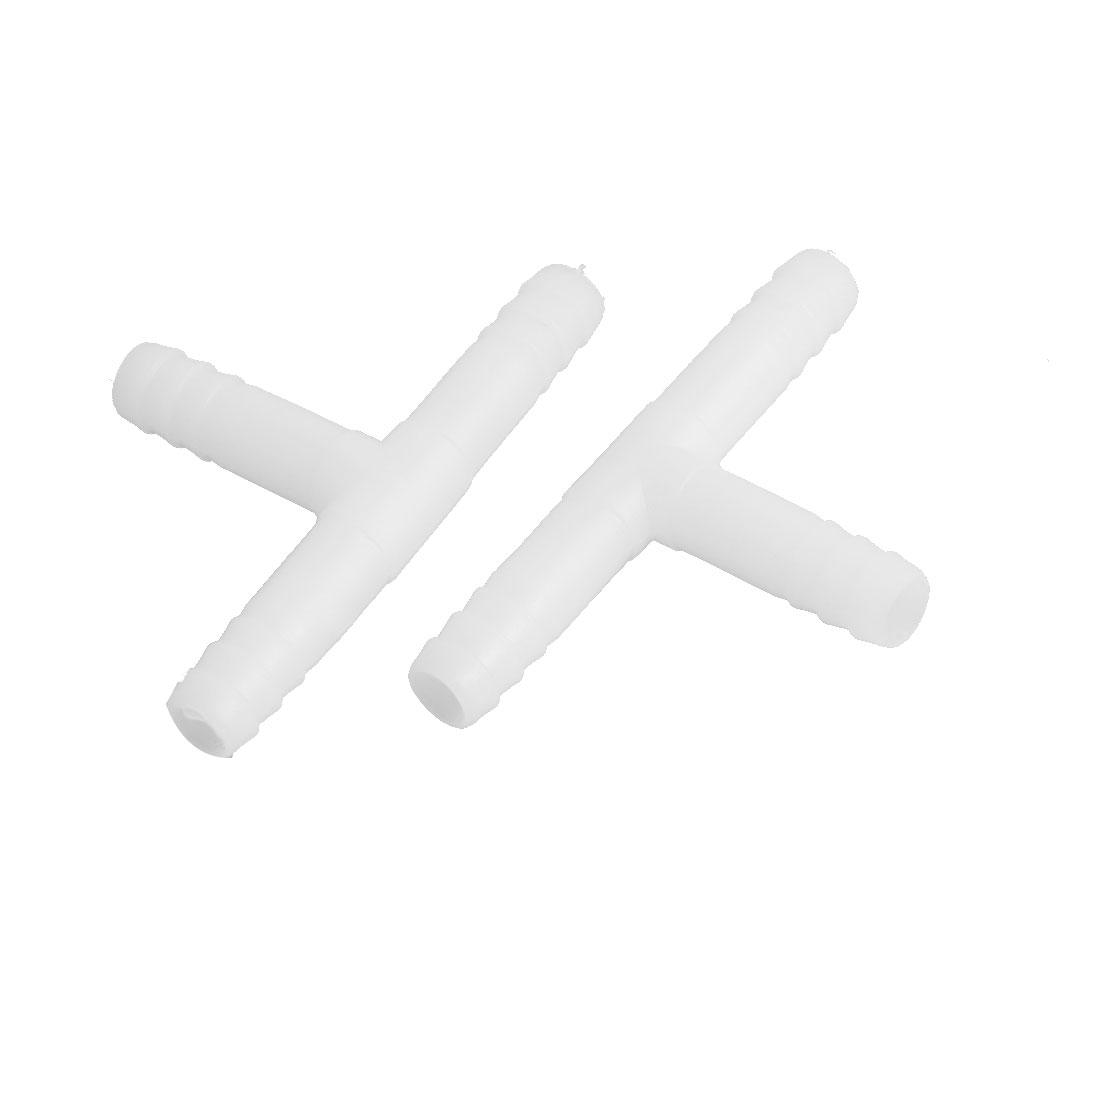 "25/64"" Dia 3 Ways Hose Barb Pipe T Connector Adapter Coupler Plastic 2 Pcs"